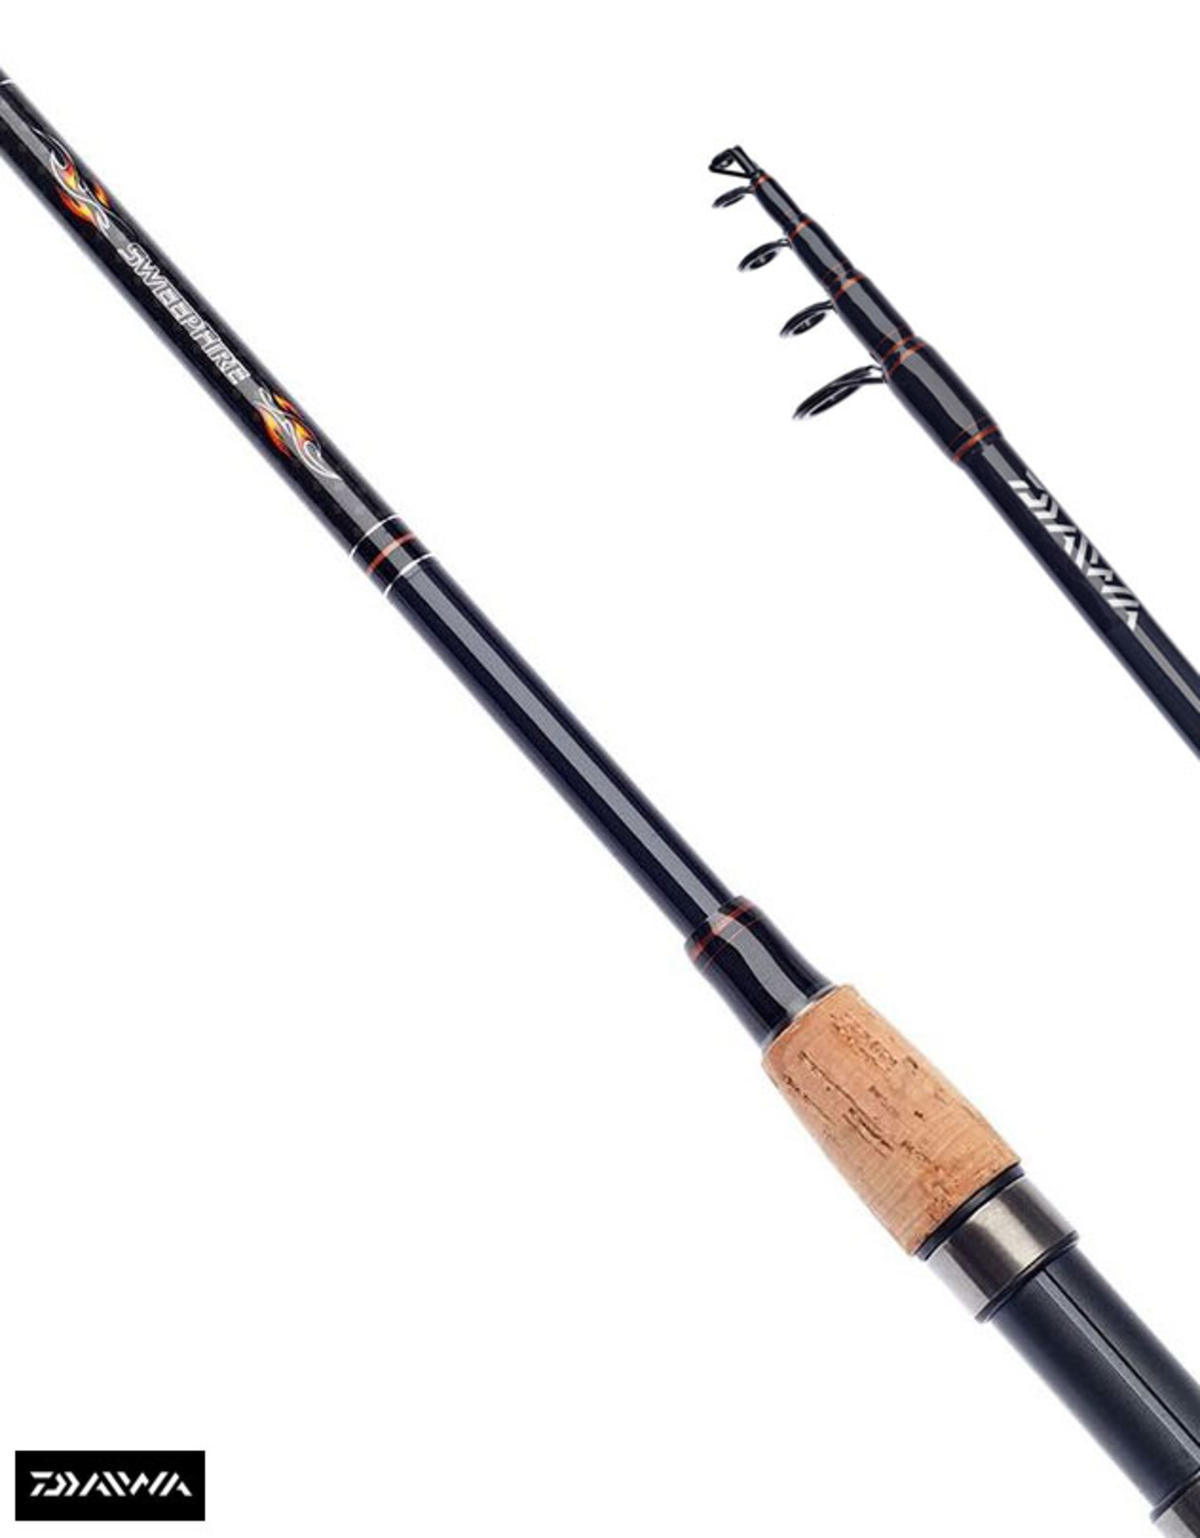 Ex Display Daiwa Sweepfire Tele Spin Rod 10ft / 20-60g  - SW300TH-BU